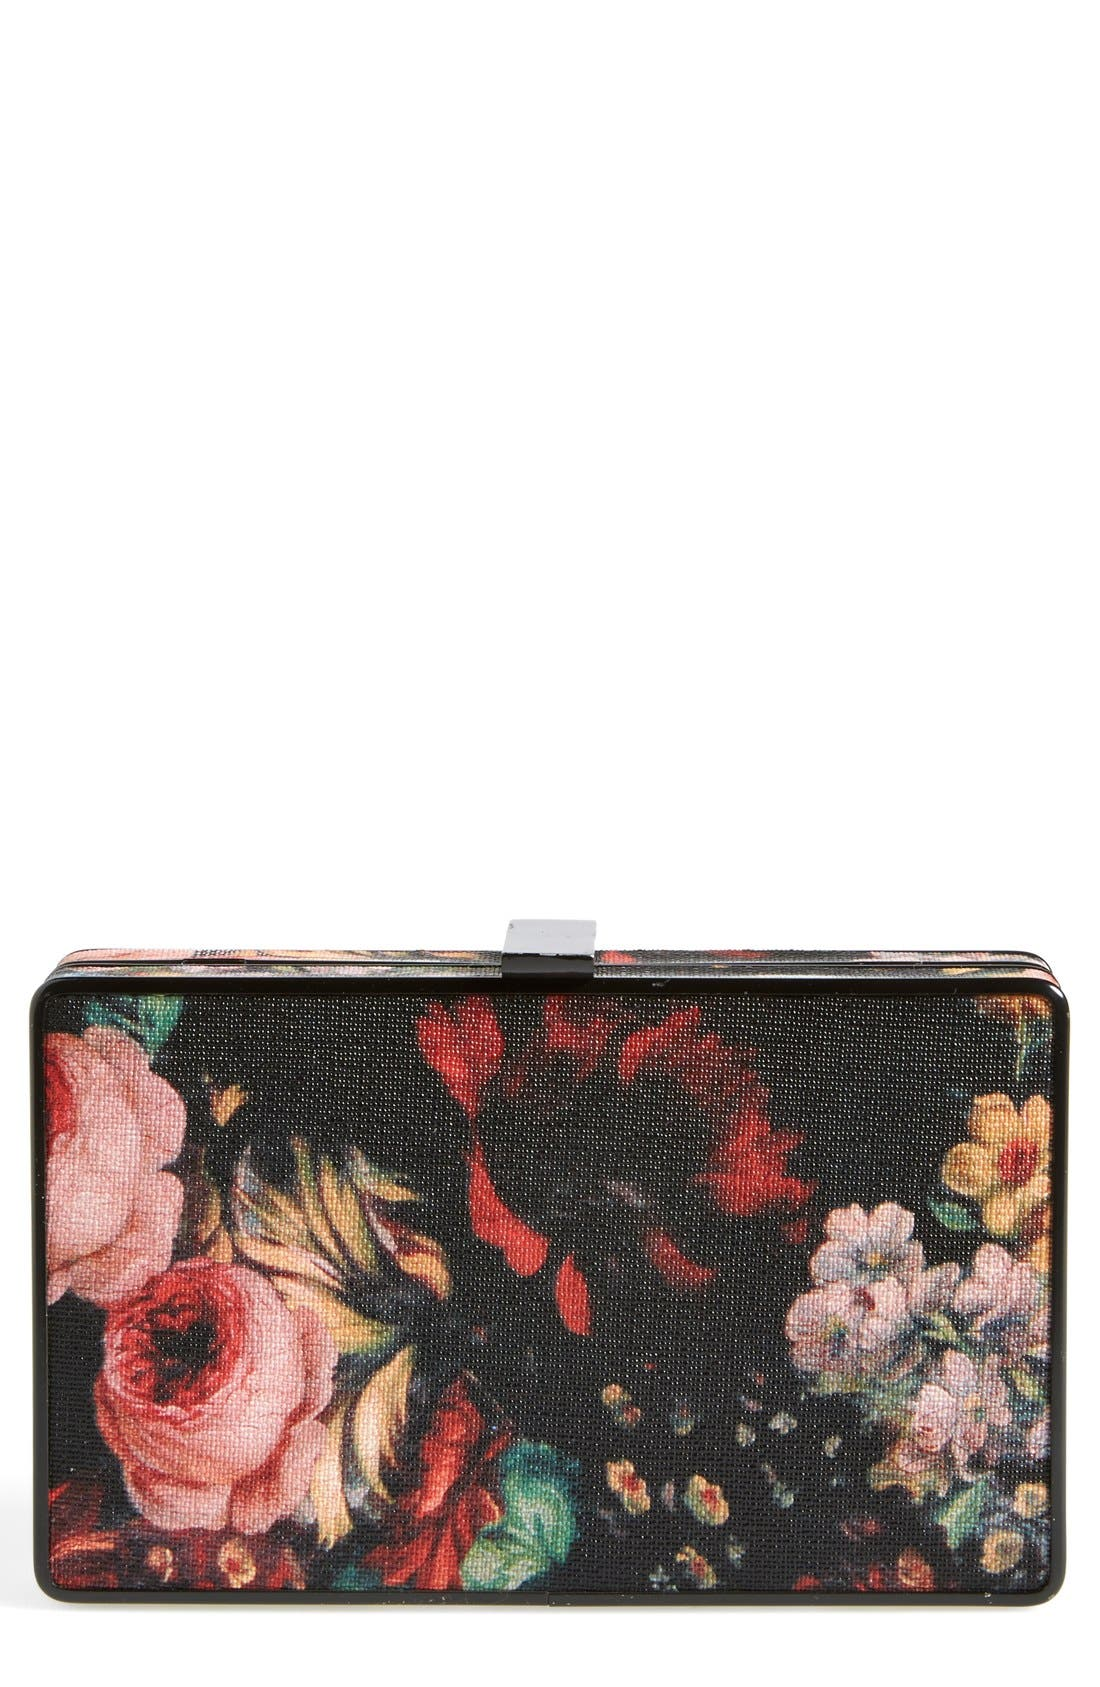 Main Image - Natasha Couture Floral Clutch